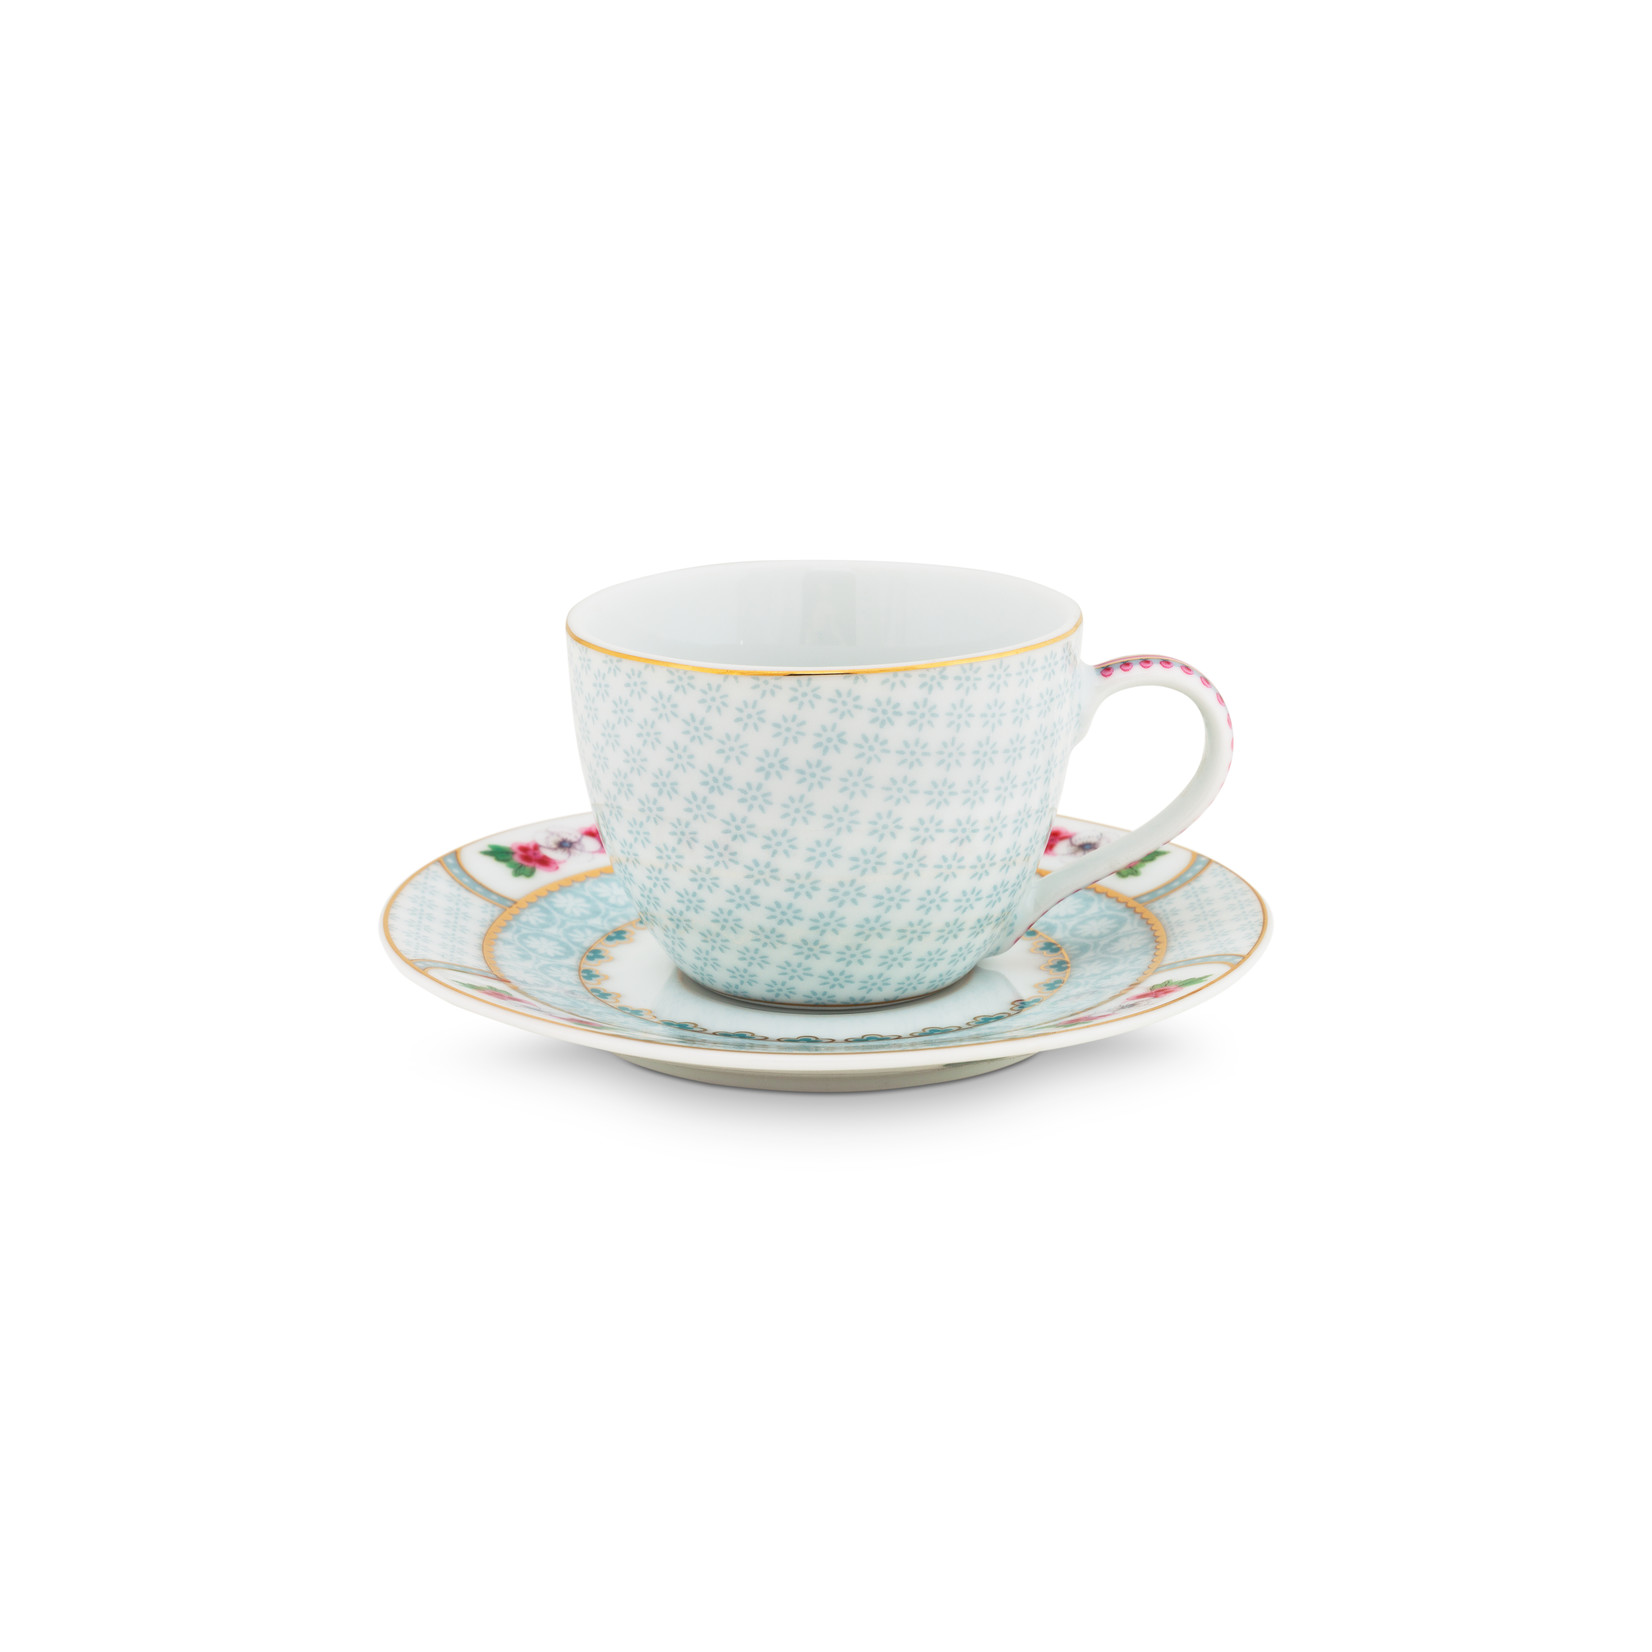 PIP Studio Espresso Cup & Saucer Blushing Birds White 120ml